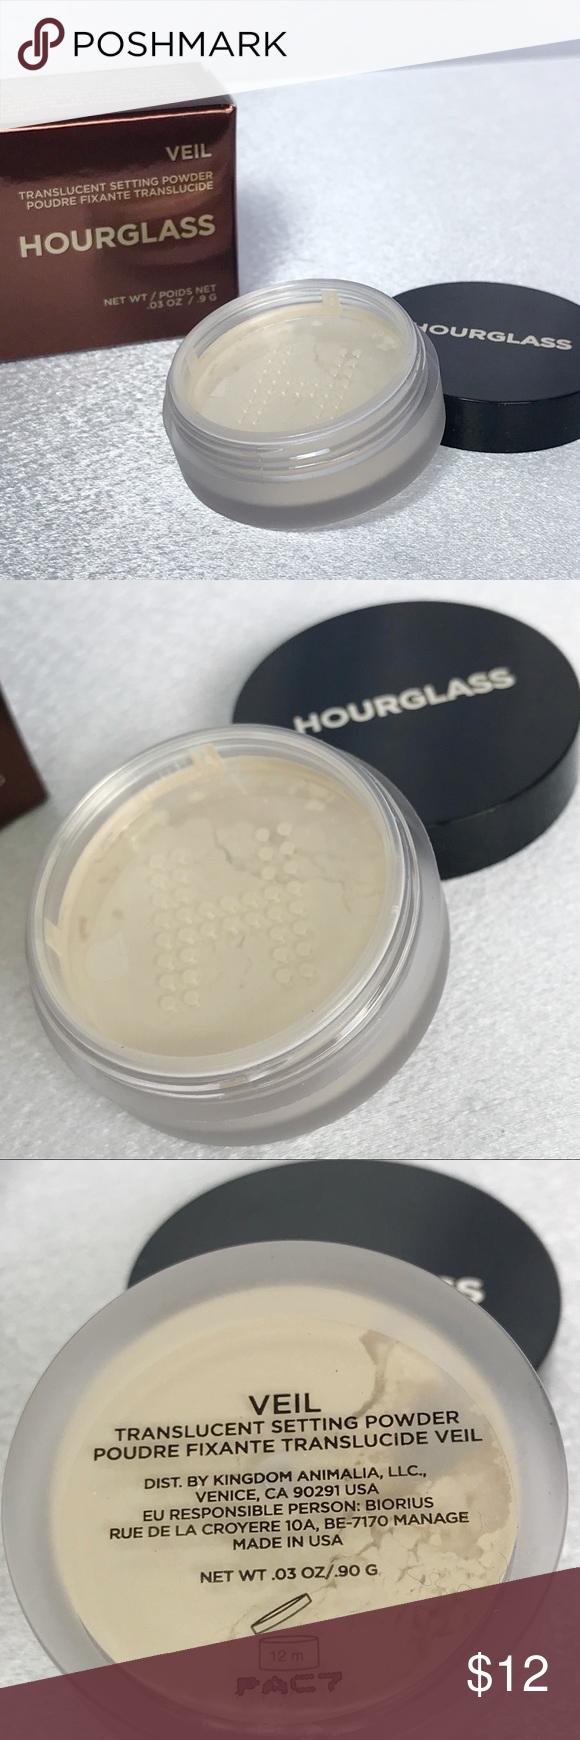 ce397b6c5adf6 🆕Hourglass Veil Translucent Setting Powder🆕 Brand new in box Hourglass  Veil Translucent Setting Powder